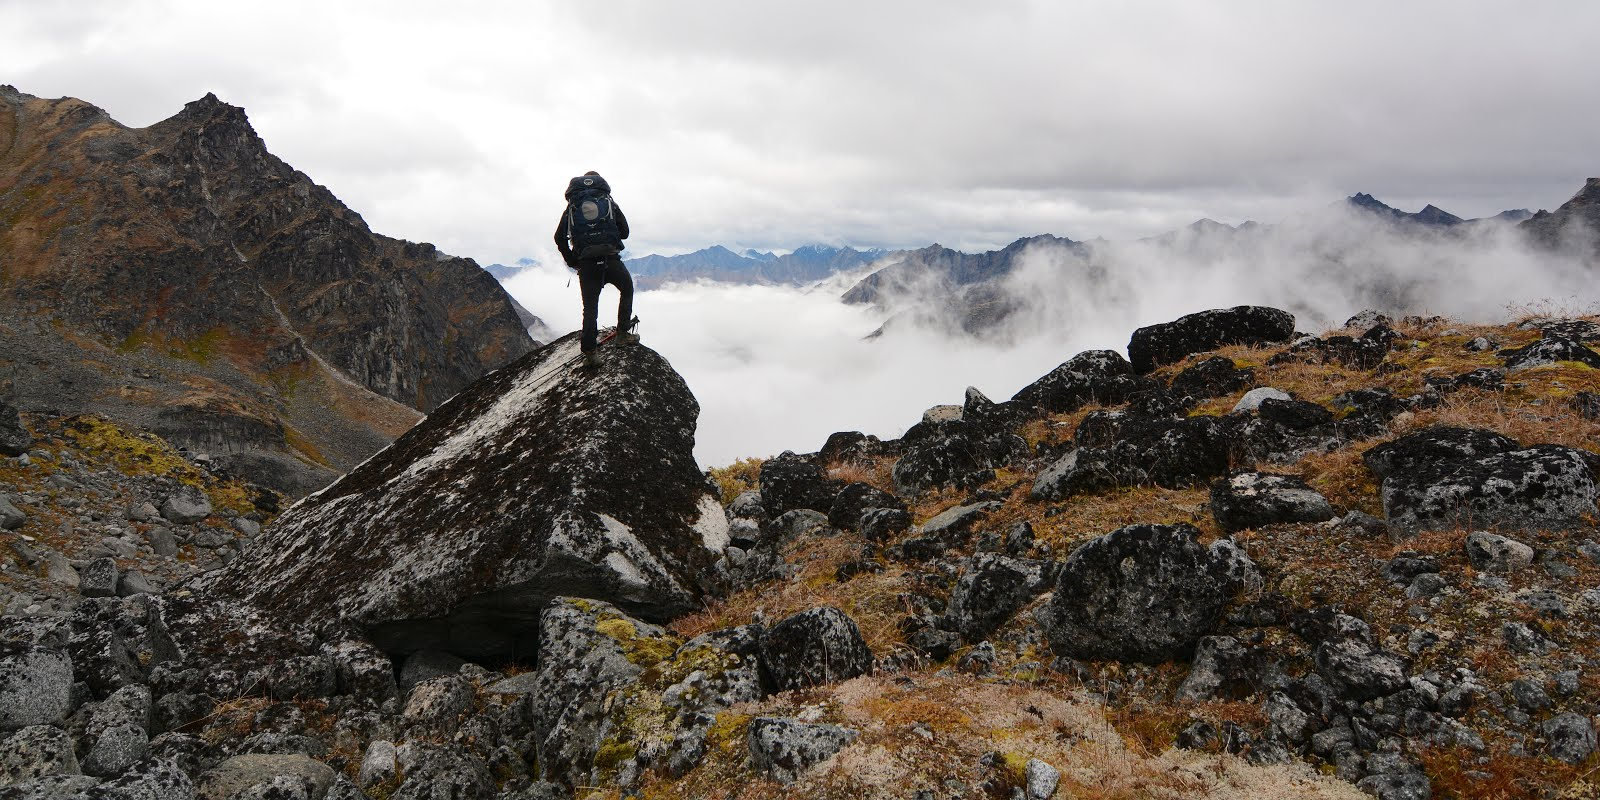 Hiking_in_the_Talkeetna_Mountains_of_Alaska.JPG